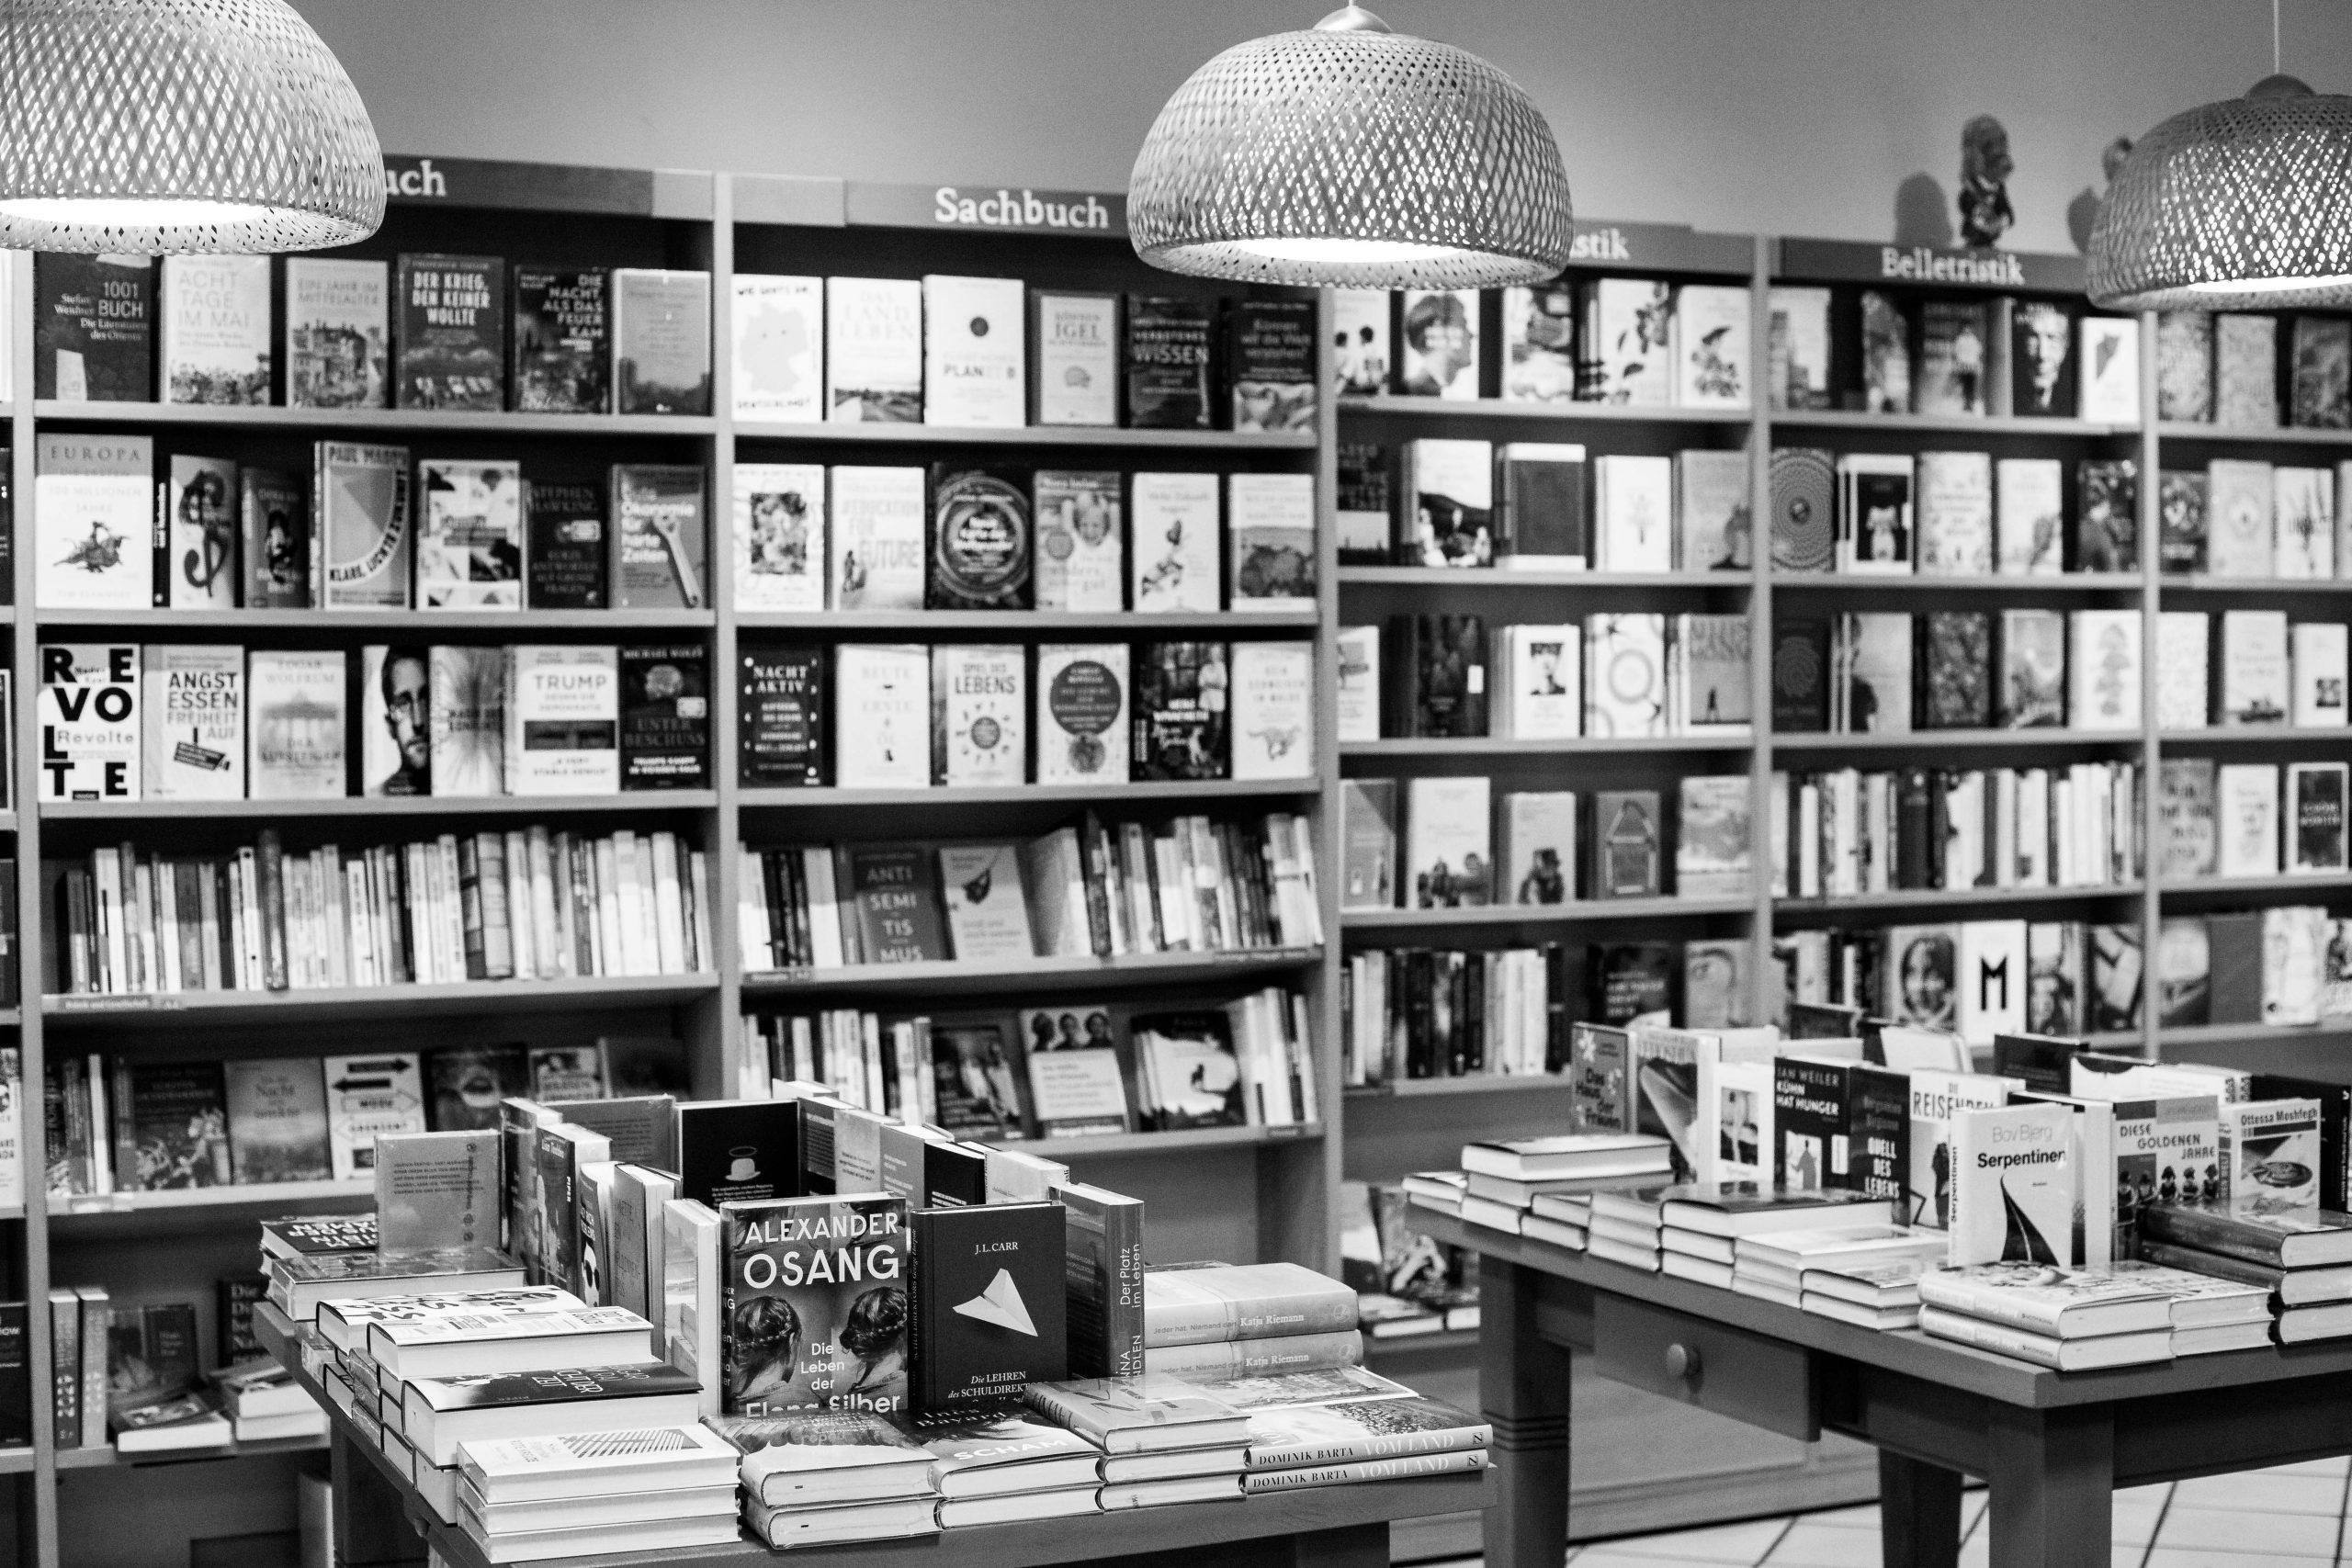 Sortiment | Buechertische | Buchregale | Neuerscheinungen | Hardcover | Gebunden | Sachbuch | Belletristik